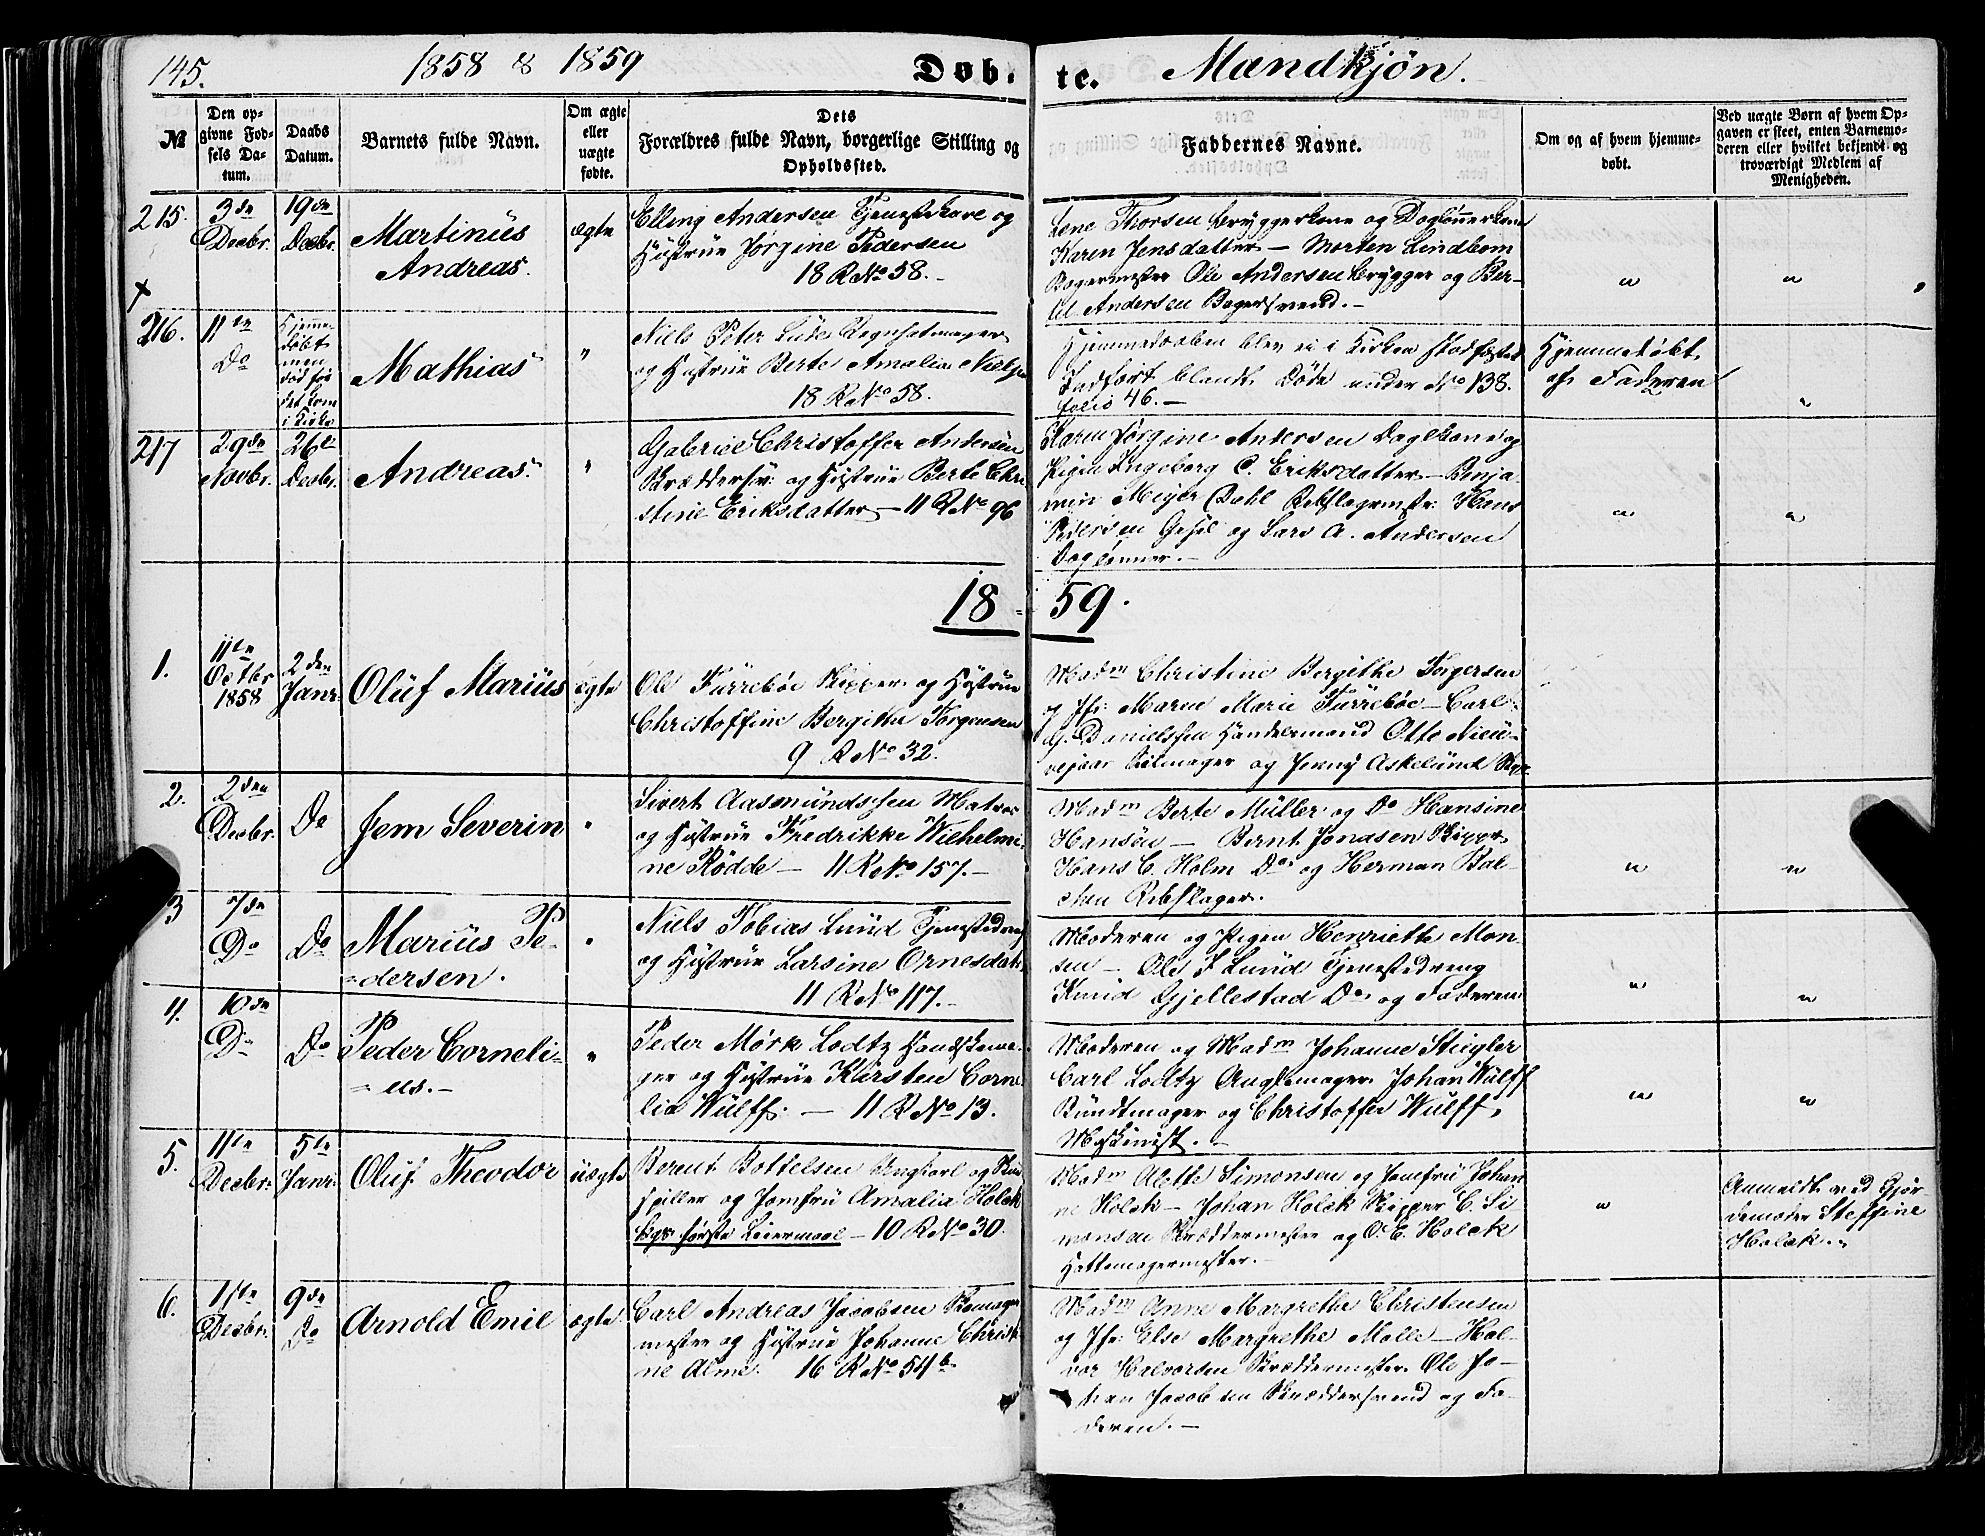 SAB, Domkirken Sokneprestembete, H/Haa/L0020: Ministerialbok nr. B 3, 1851-1859, s. 145